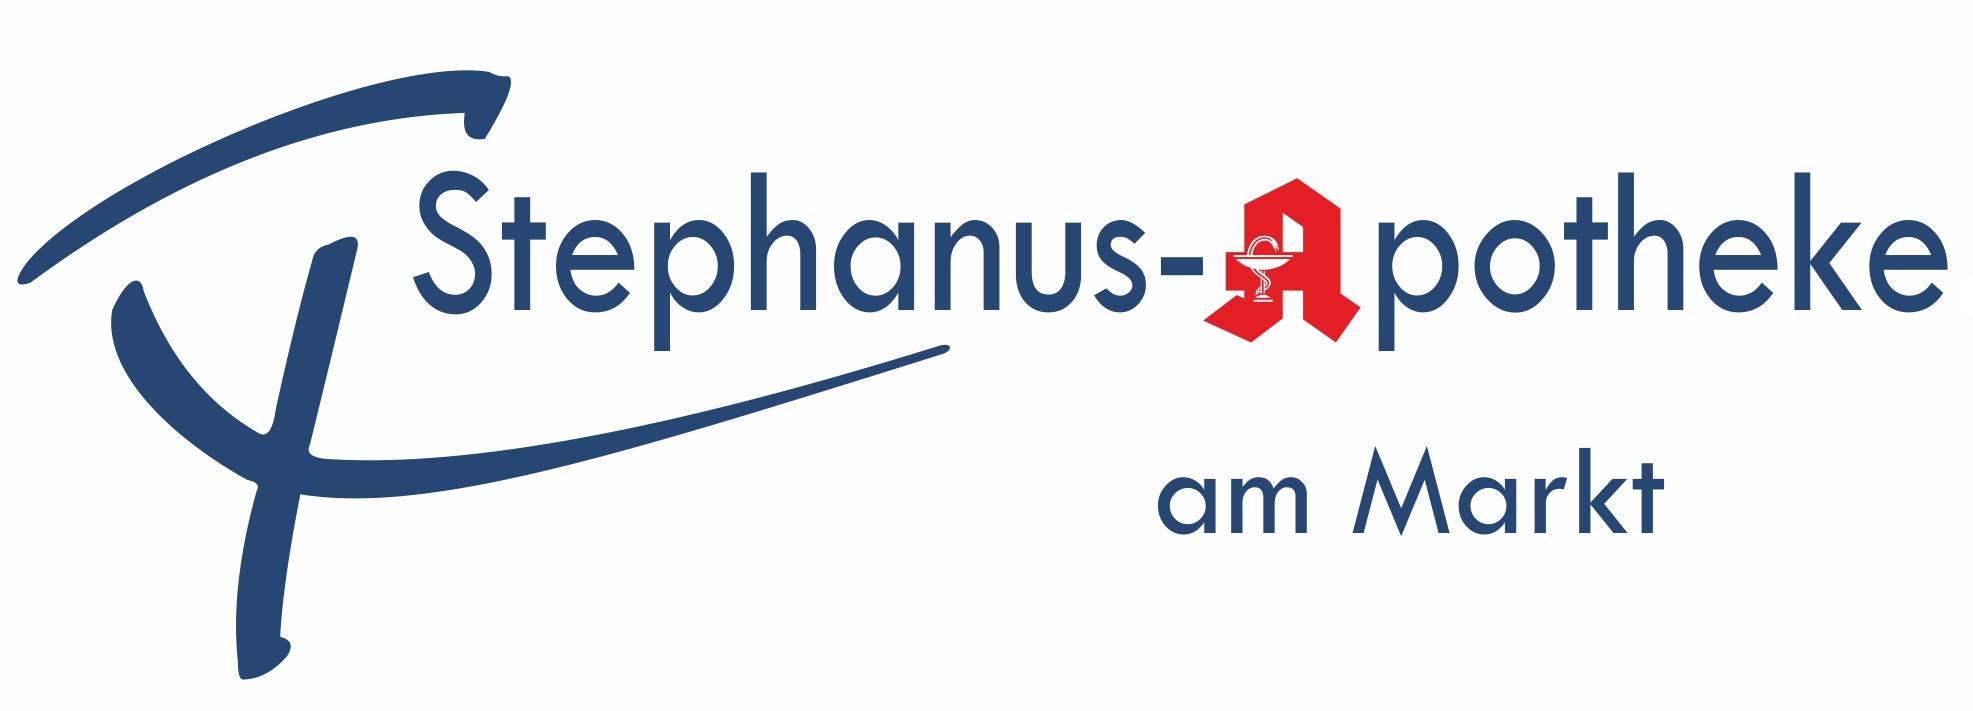 Logo der Stephanus-Apotheke